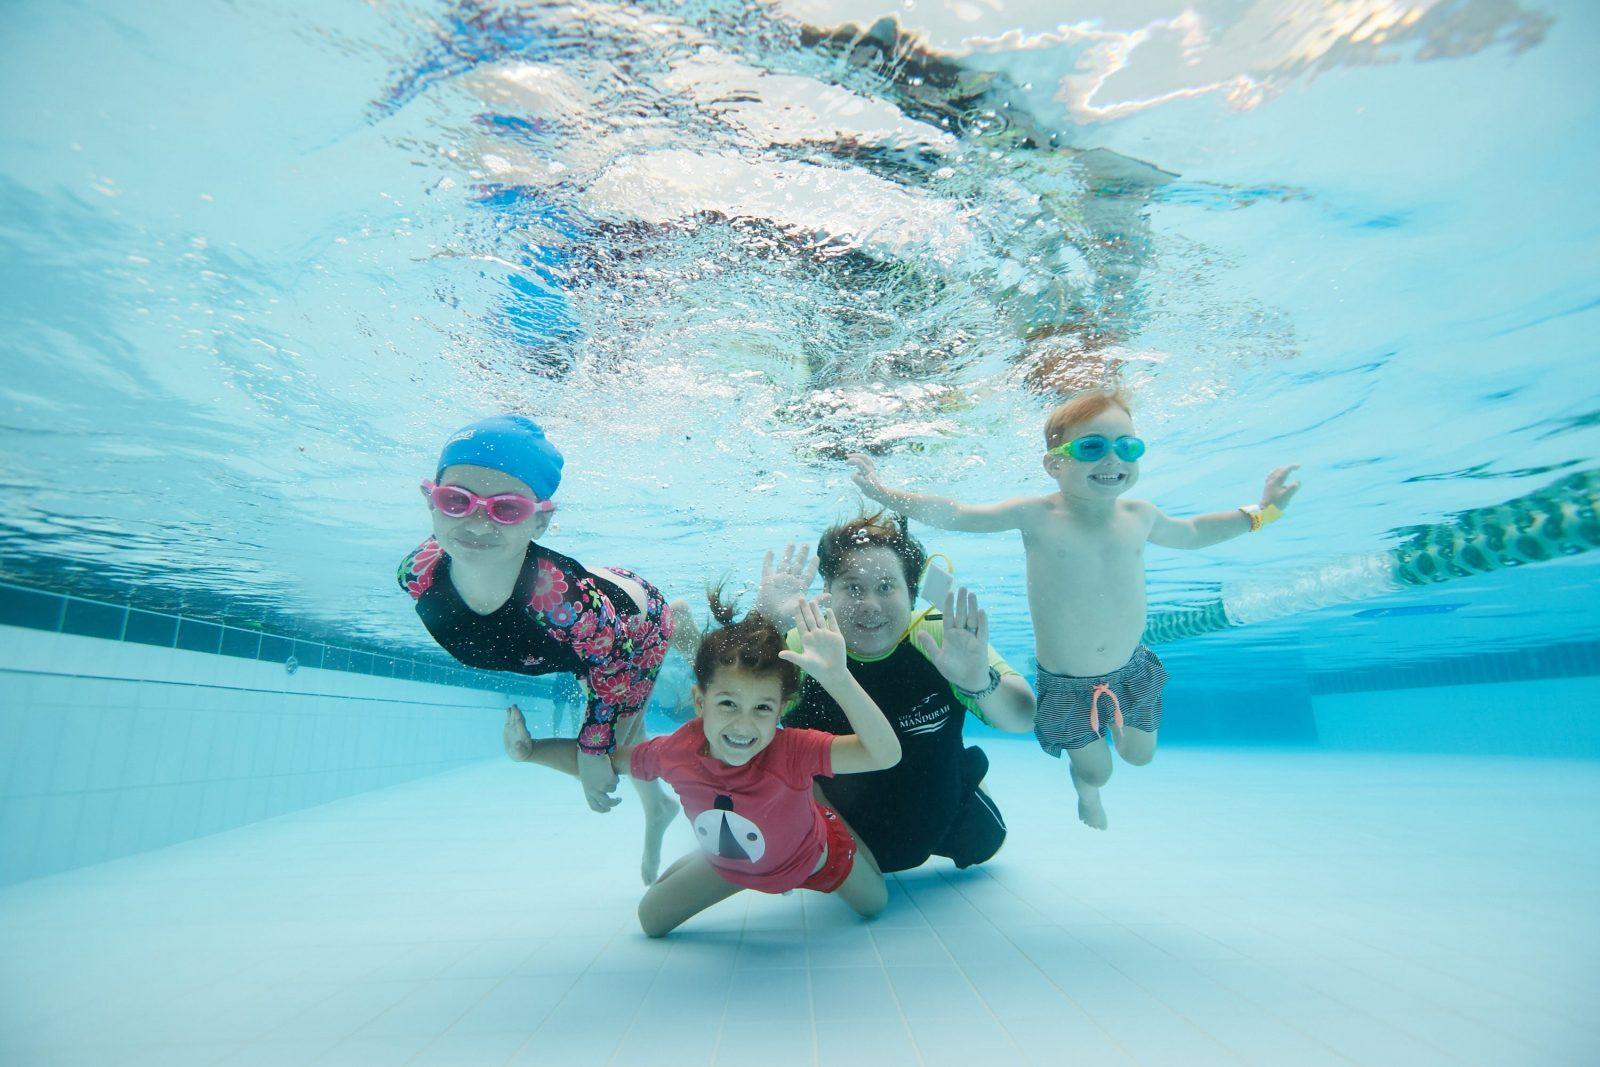 Mandurah Aquatic and Recreation Open Day, Mandurah, Western Australia